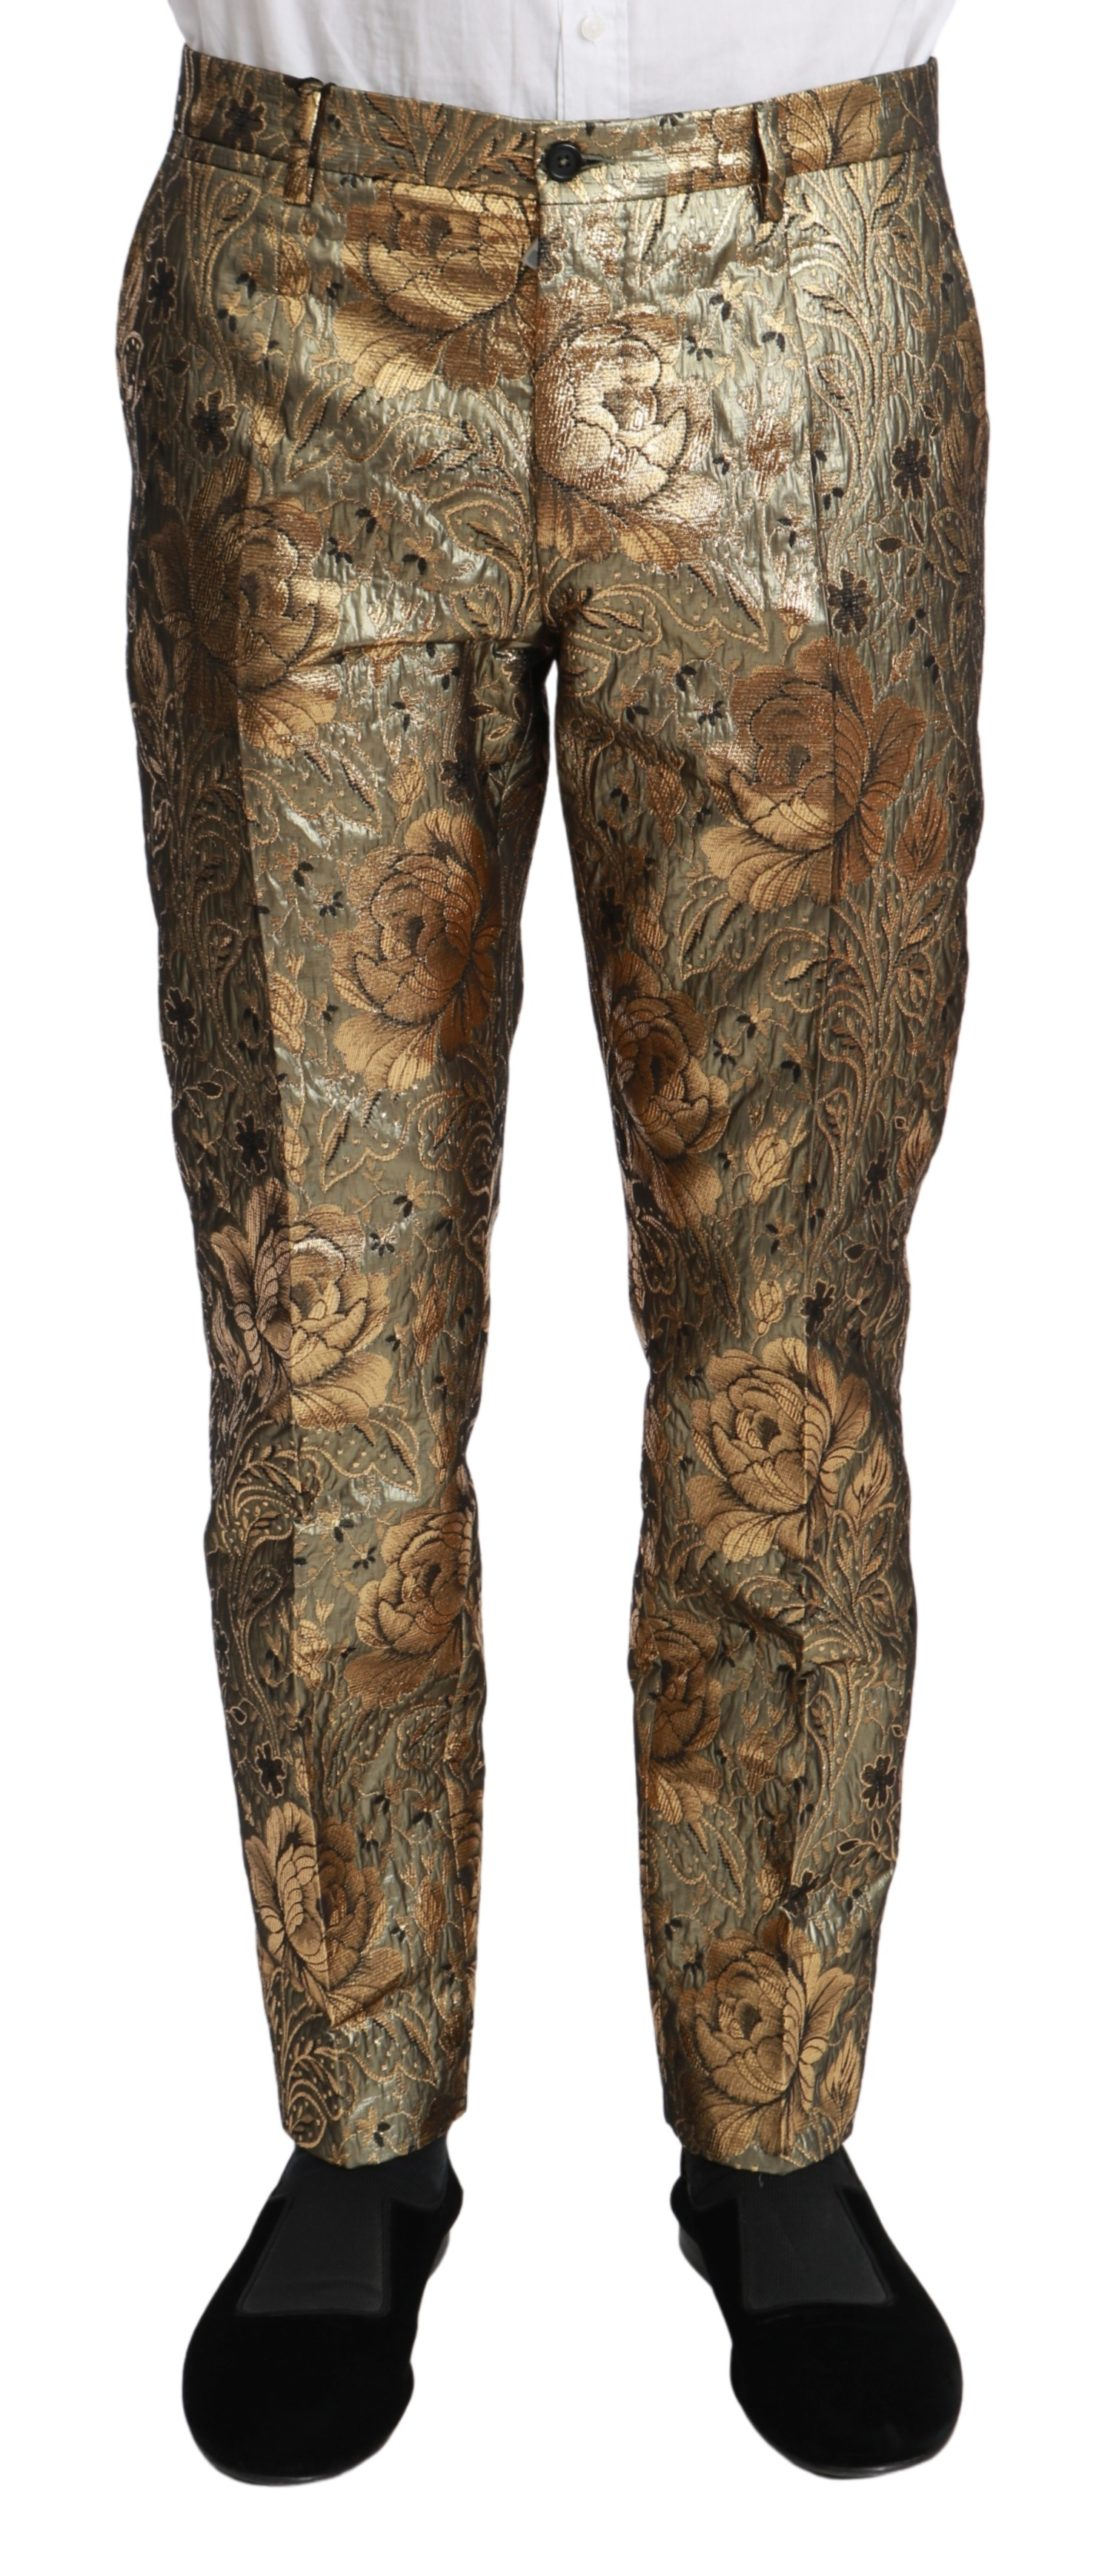 Dolce & Gabbana Men's Jacquard Slim Dress Trouser Gold PAN70963 - IT48 | M